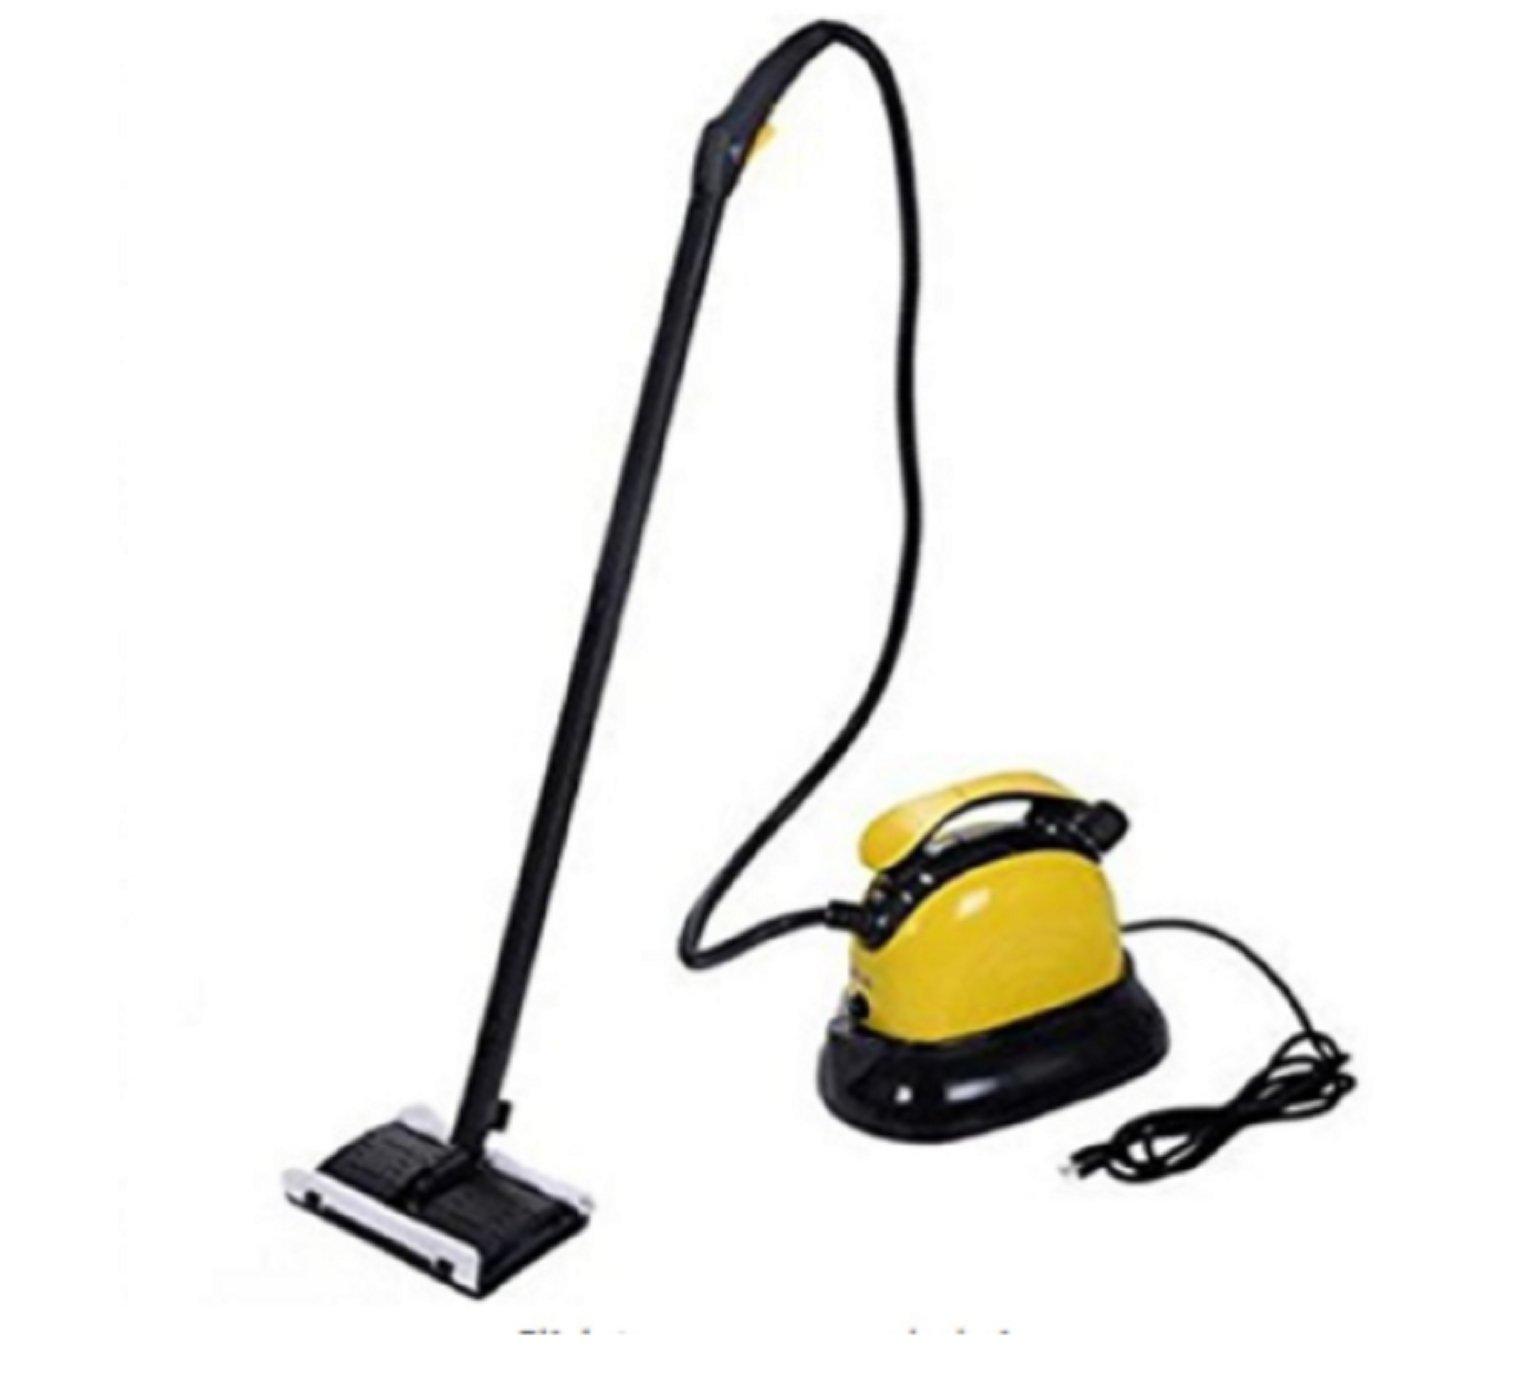 USA Premium Store 1500W Portable Pressure Steam Cleaner Carpet Bathroom Professional Multi Purpose by USA Premium Store